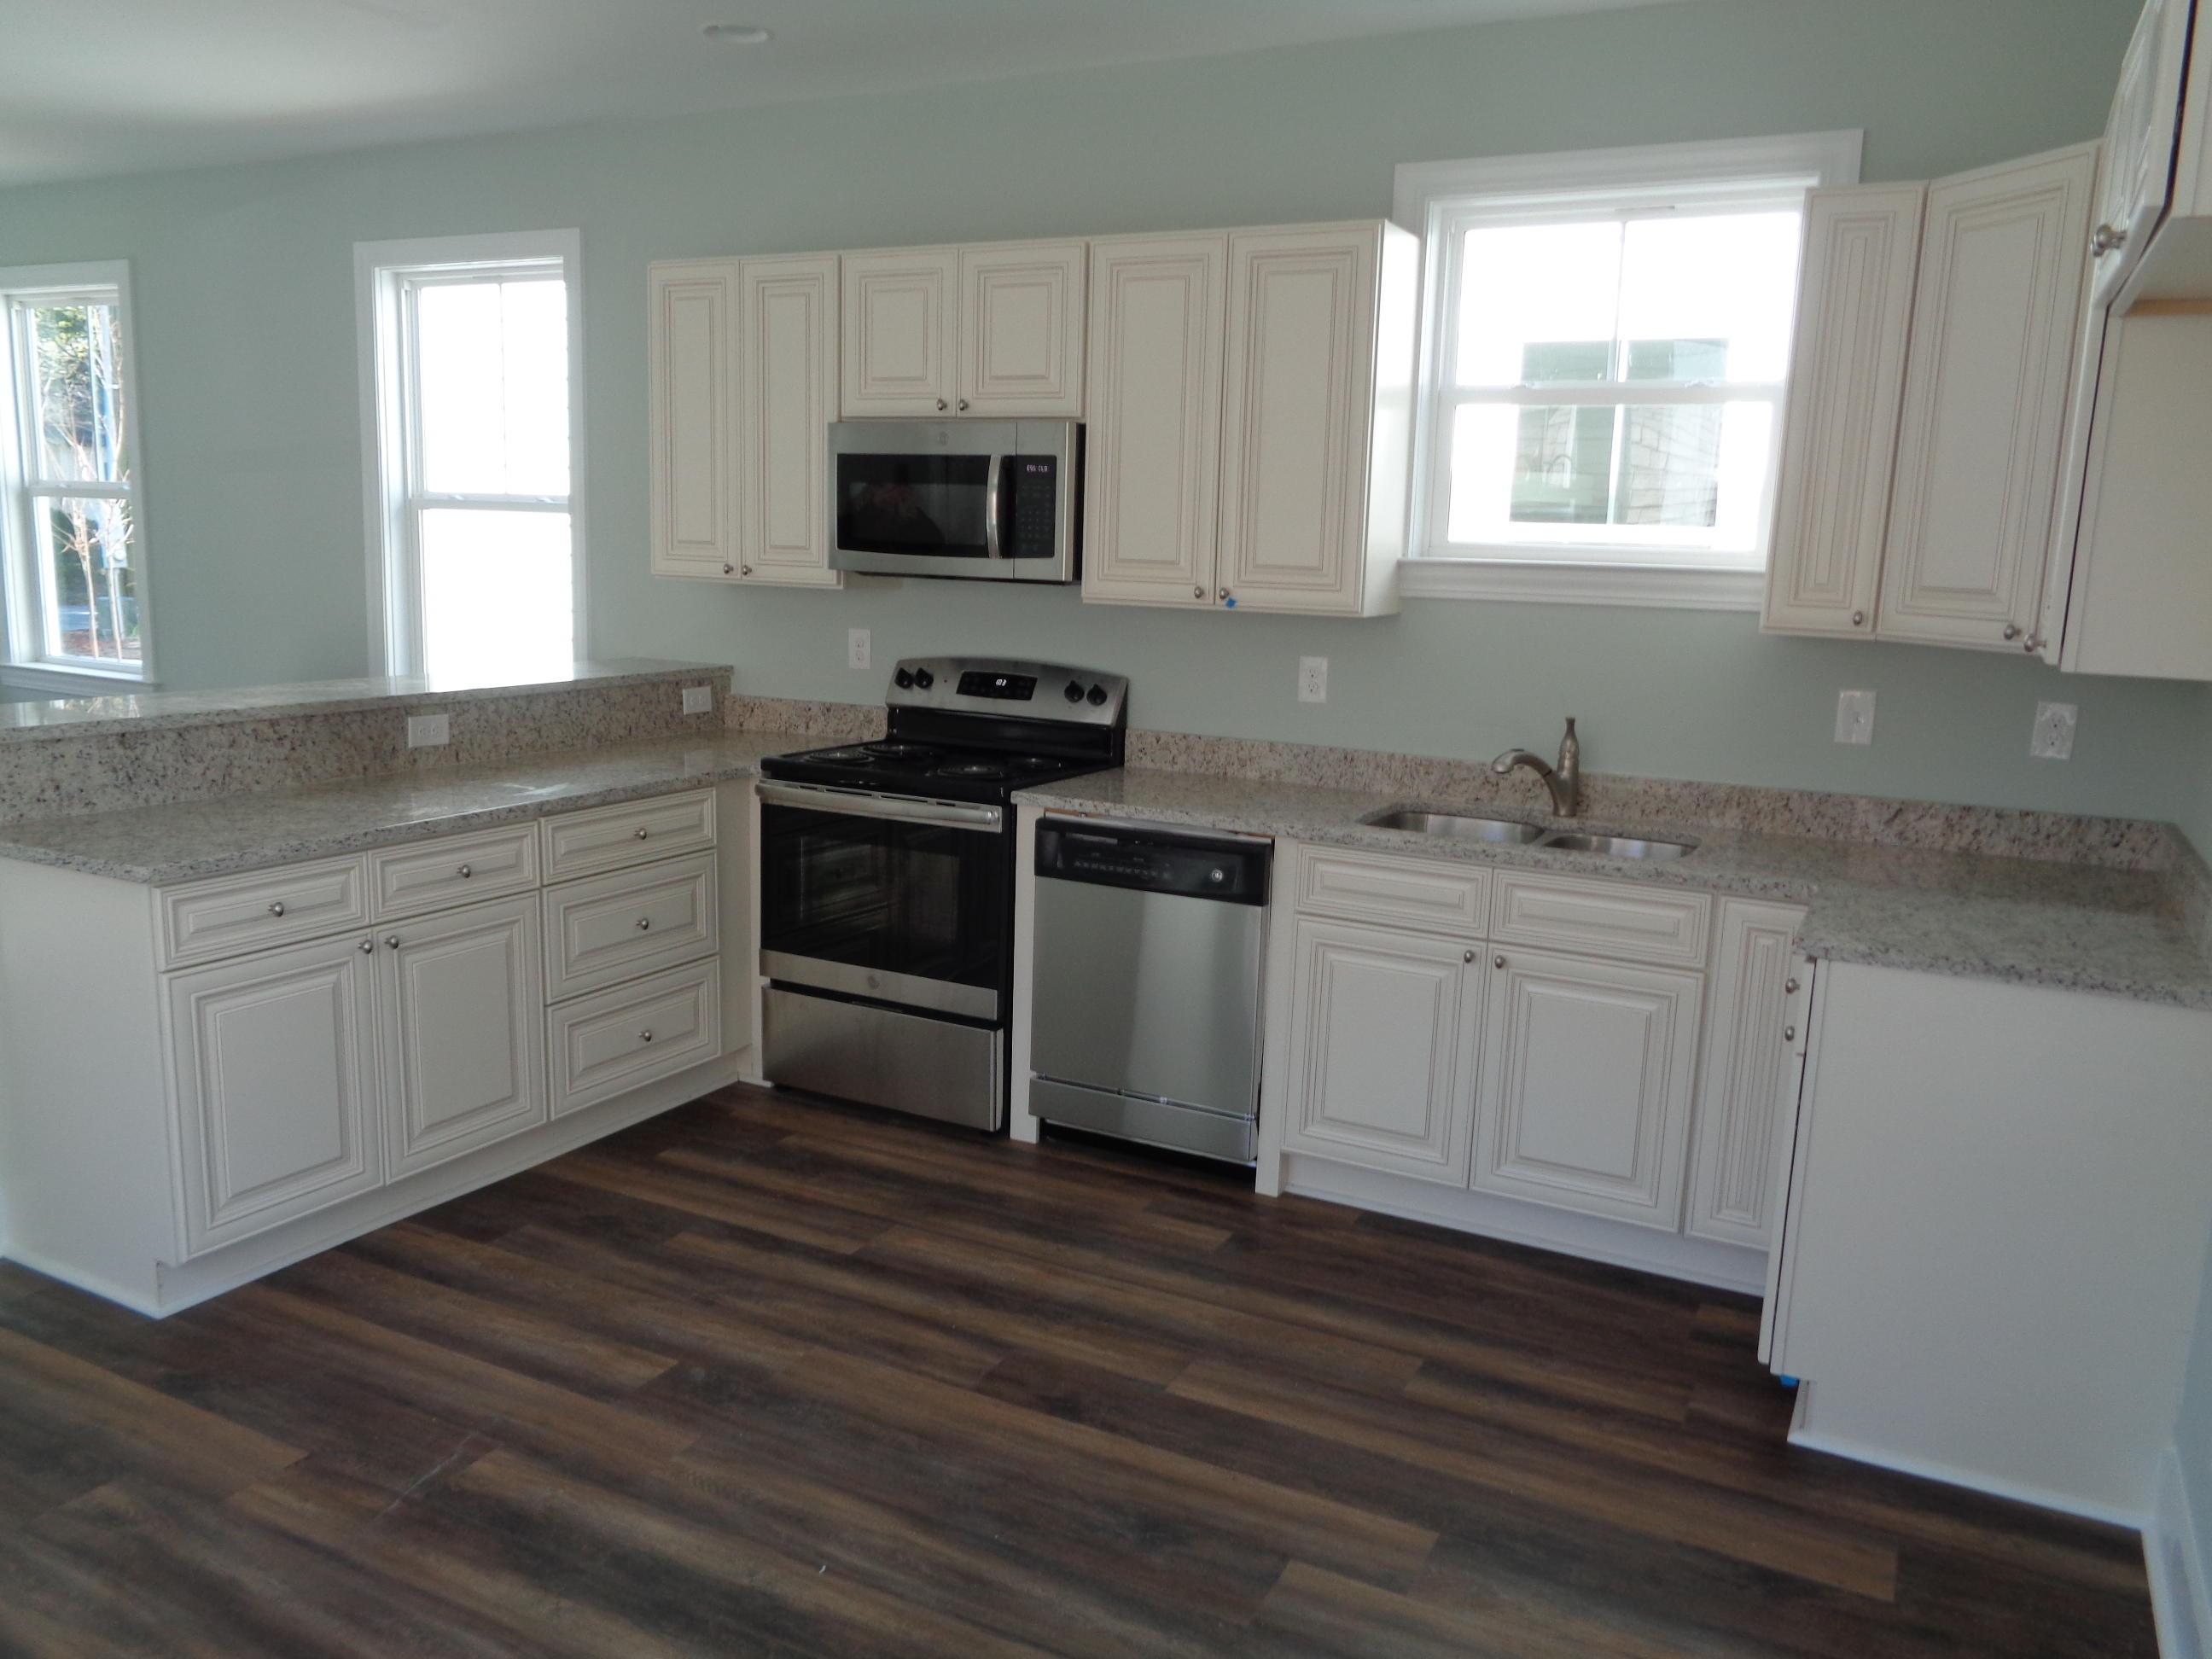 Pinecrest Gardens Homes For Sale - 1626 Wappoo, Charleston, SC - 26